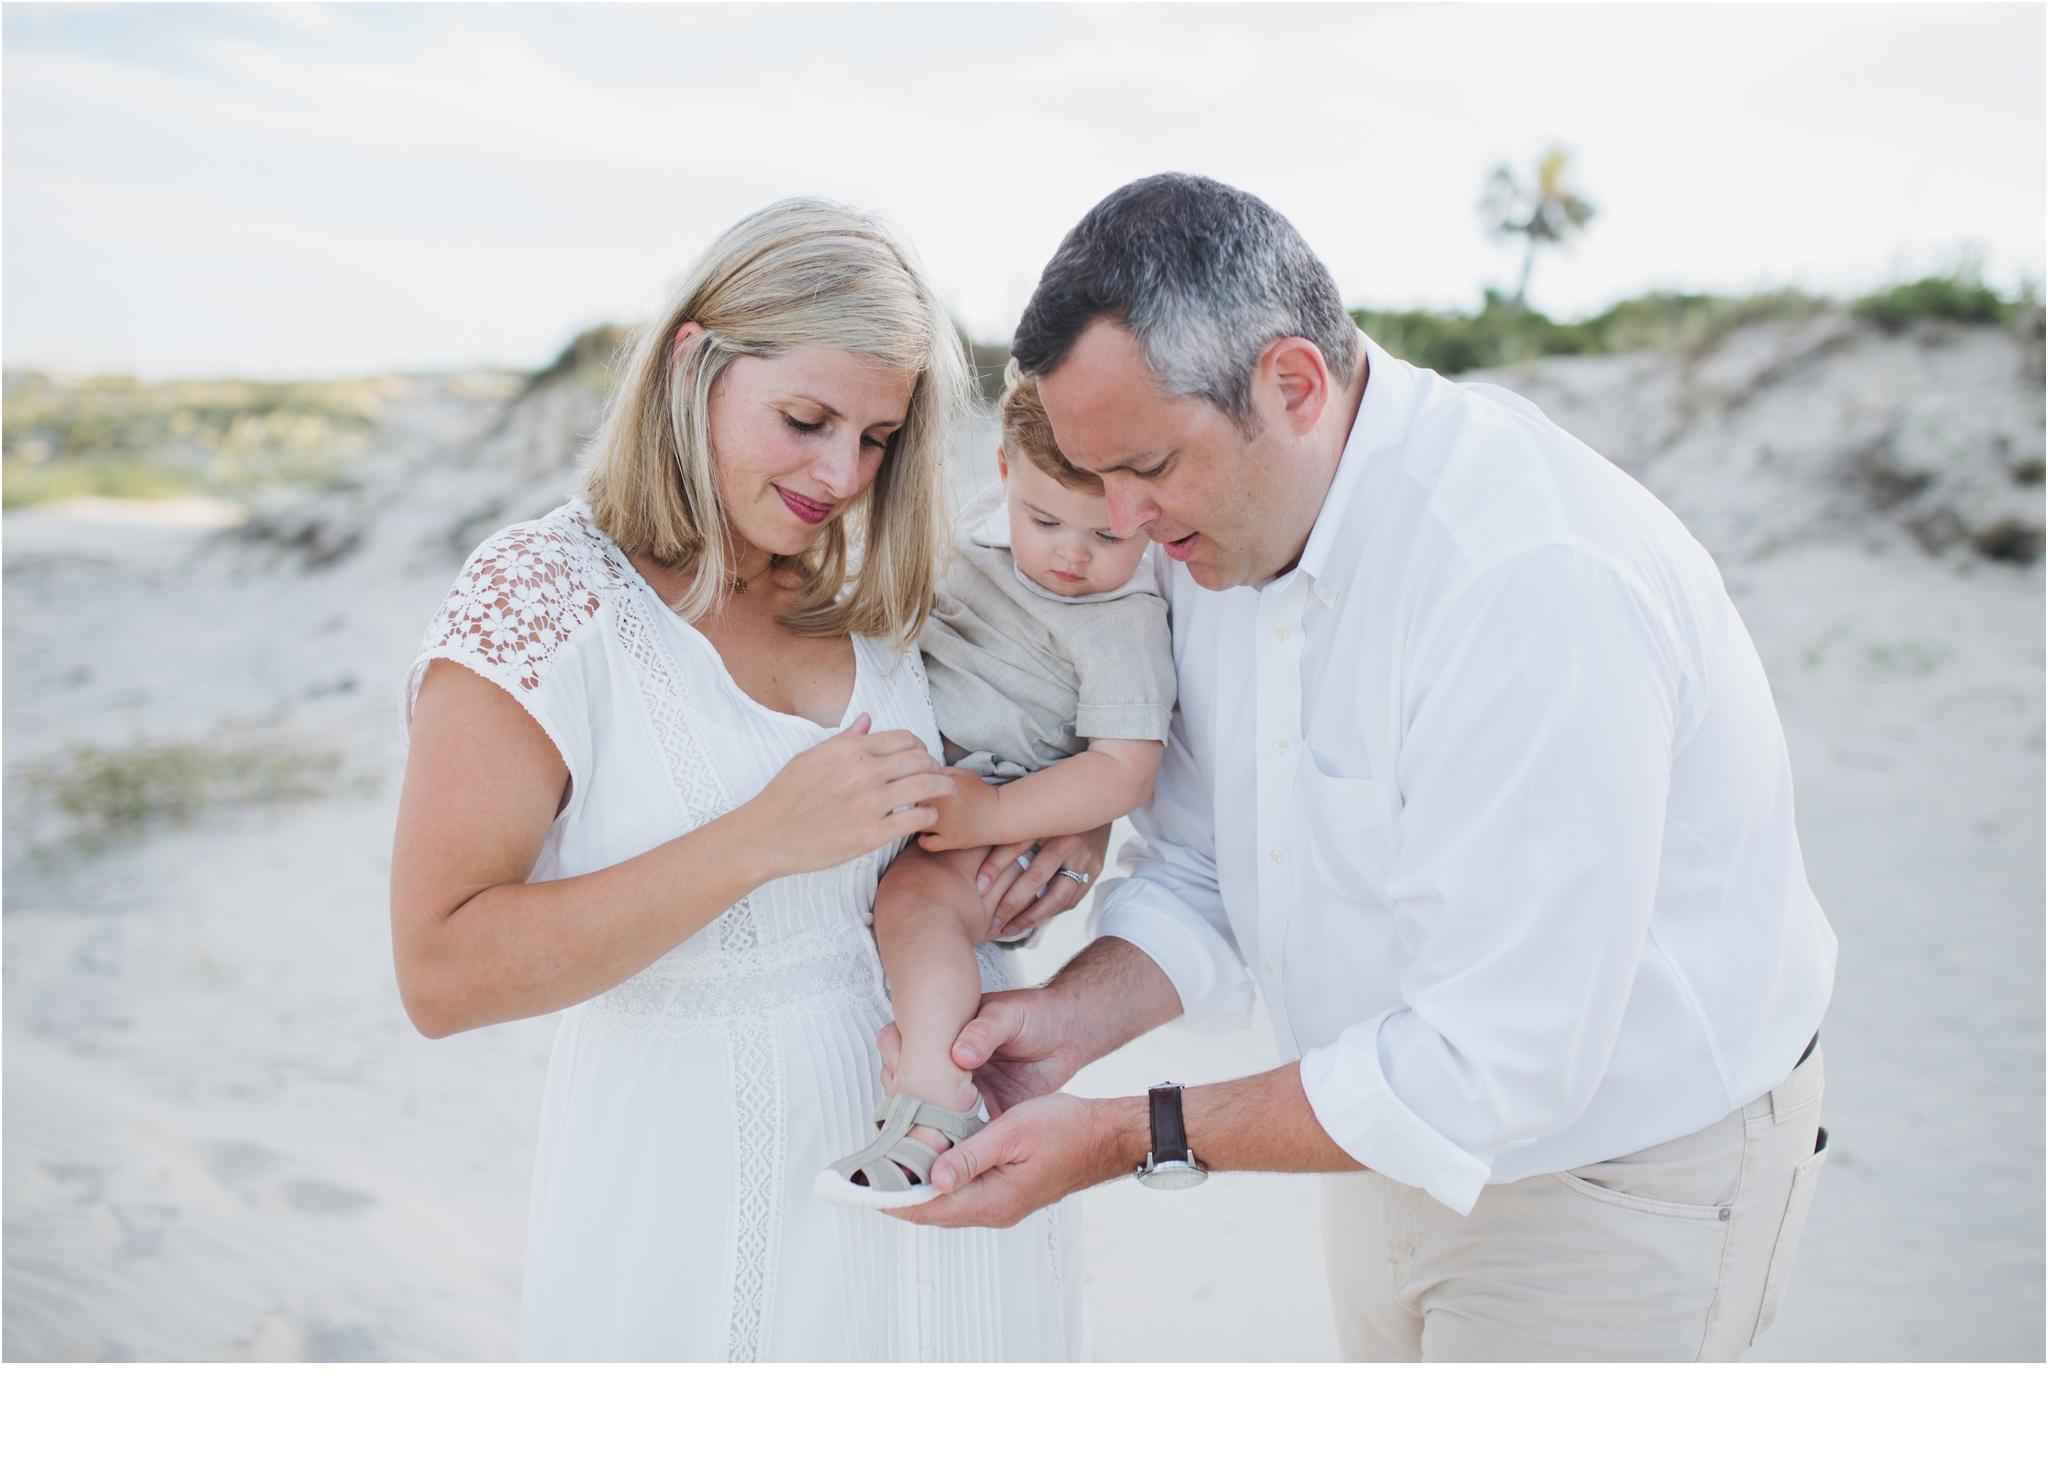 Rainey_Gregg_Photography_St._Simons_Island_Georgia_California_Wedding_Portrait_Photography_1019.jpg